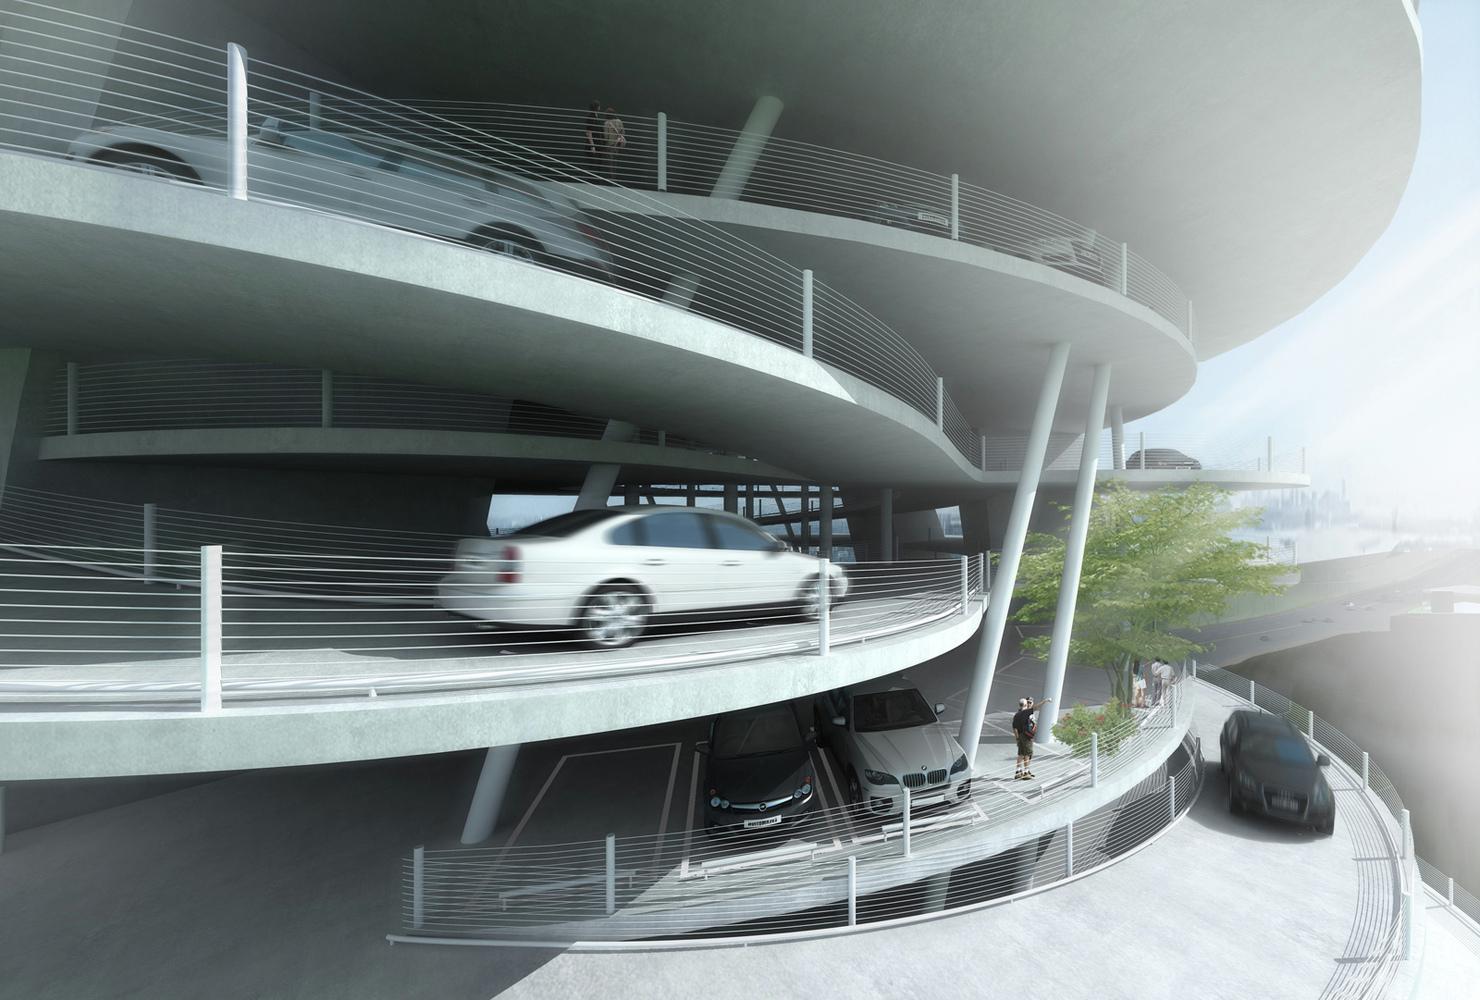 Design of car parking - Alternative Car Park Tower Proposal Mozhao Studio Parking Space